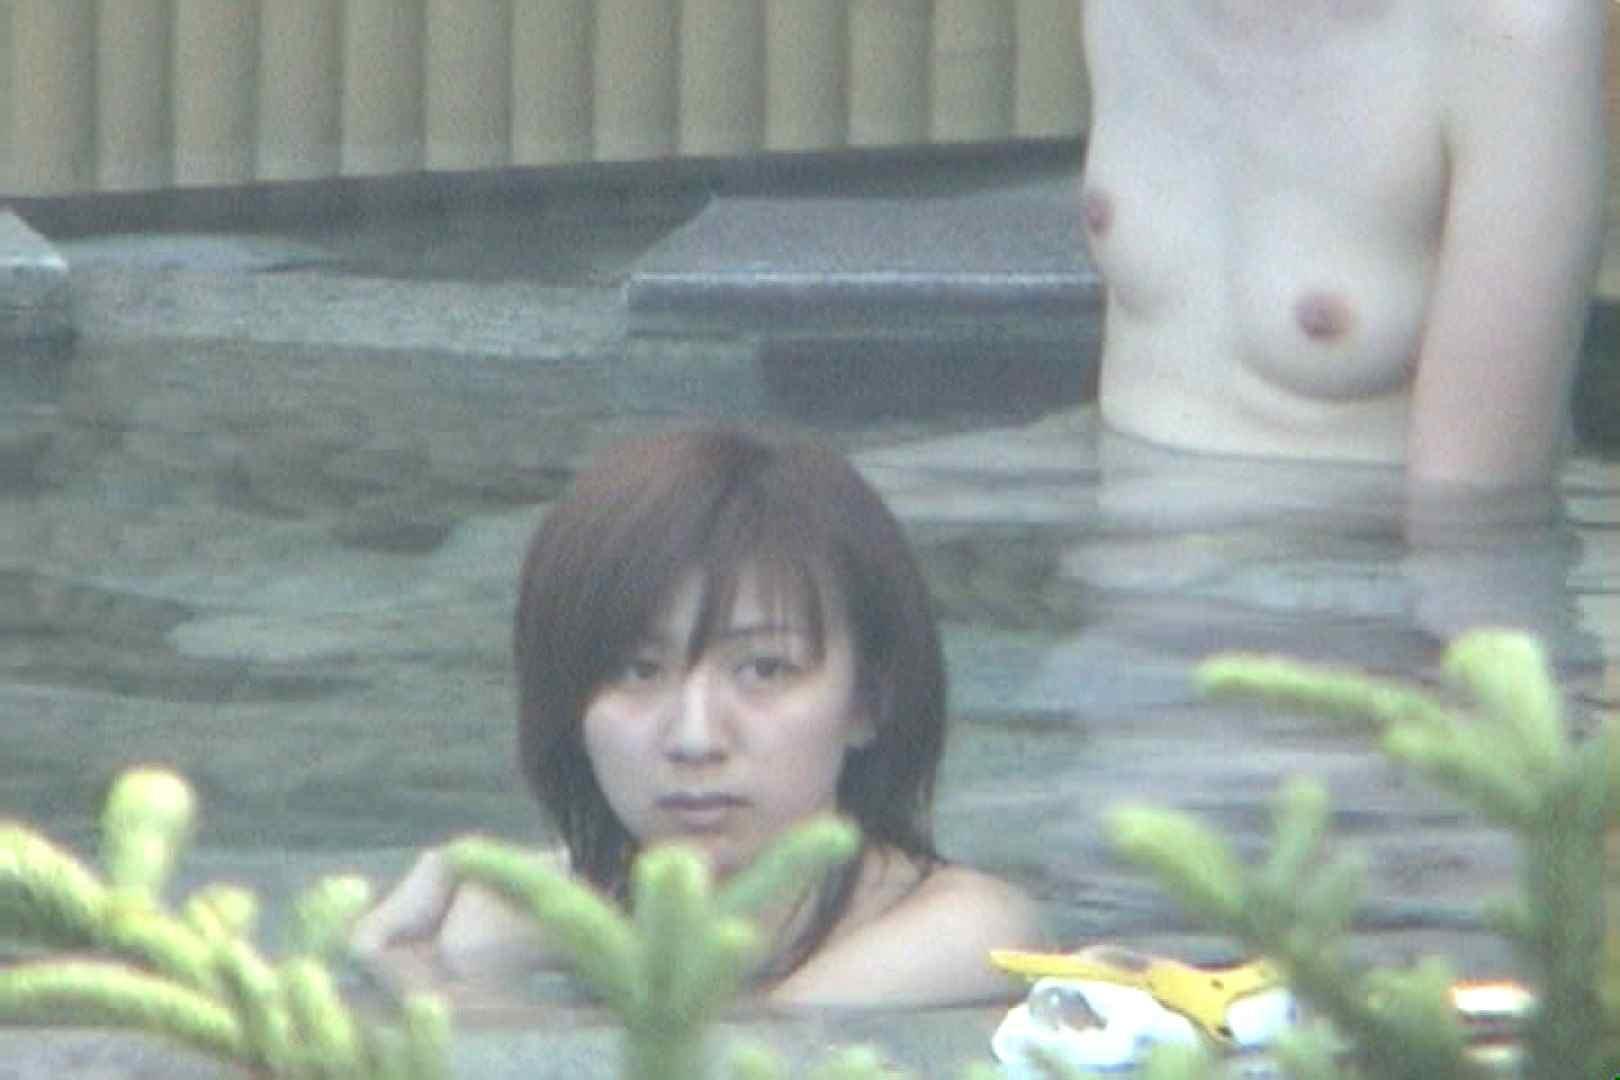 Aquaな露天風呂Vol.77【VIP限定】 露天   盗撮特集  98画像 72